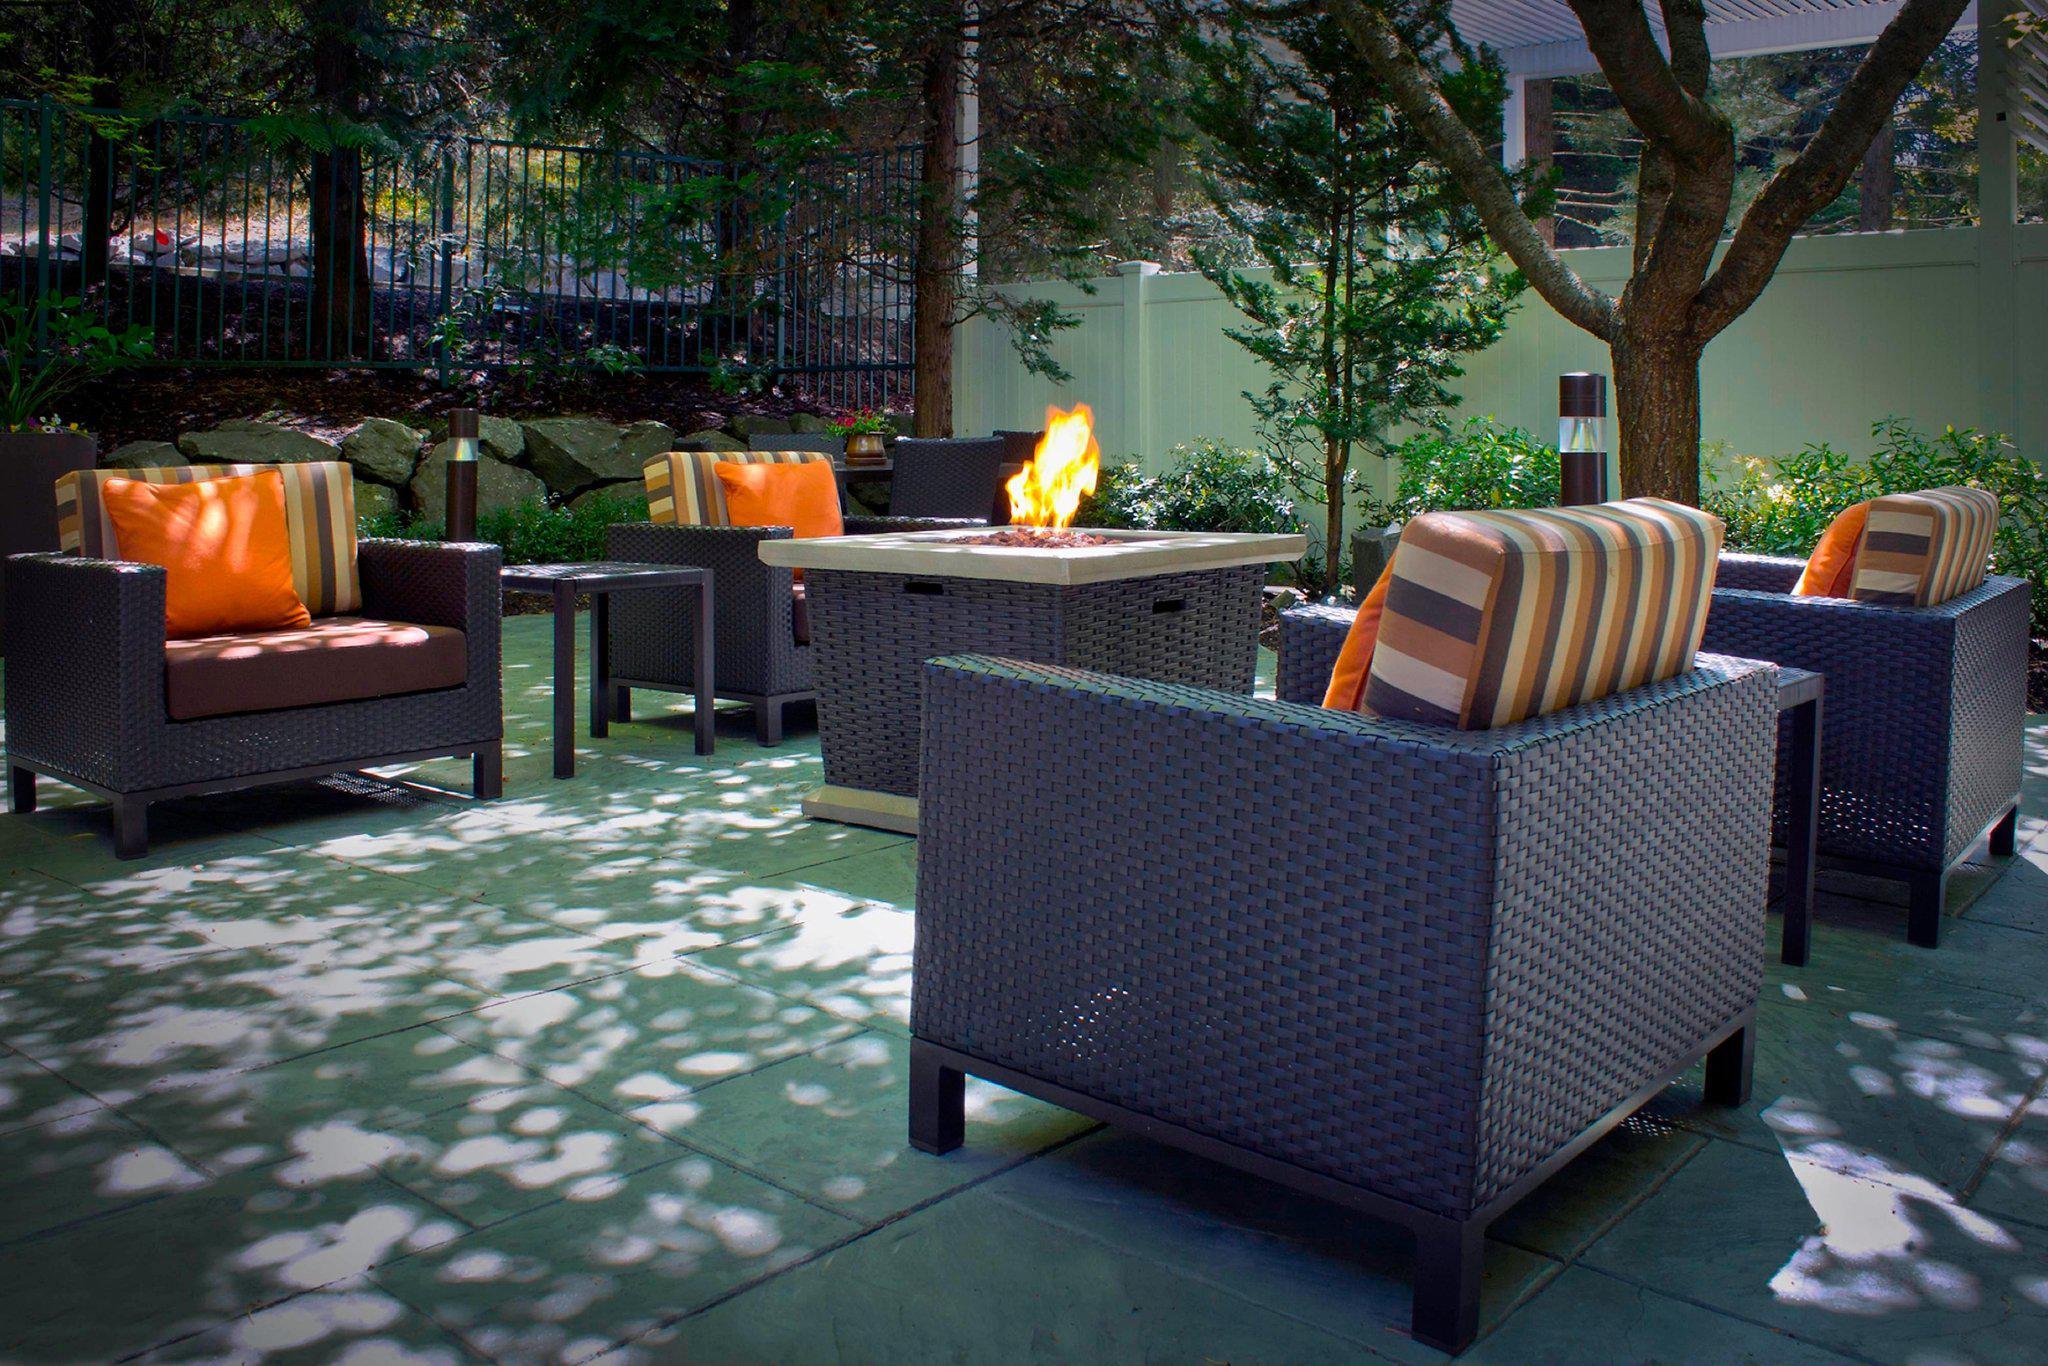 Courtyard by Marriott Portland Tigard